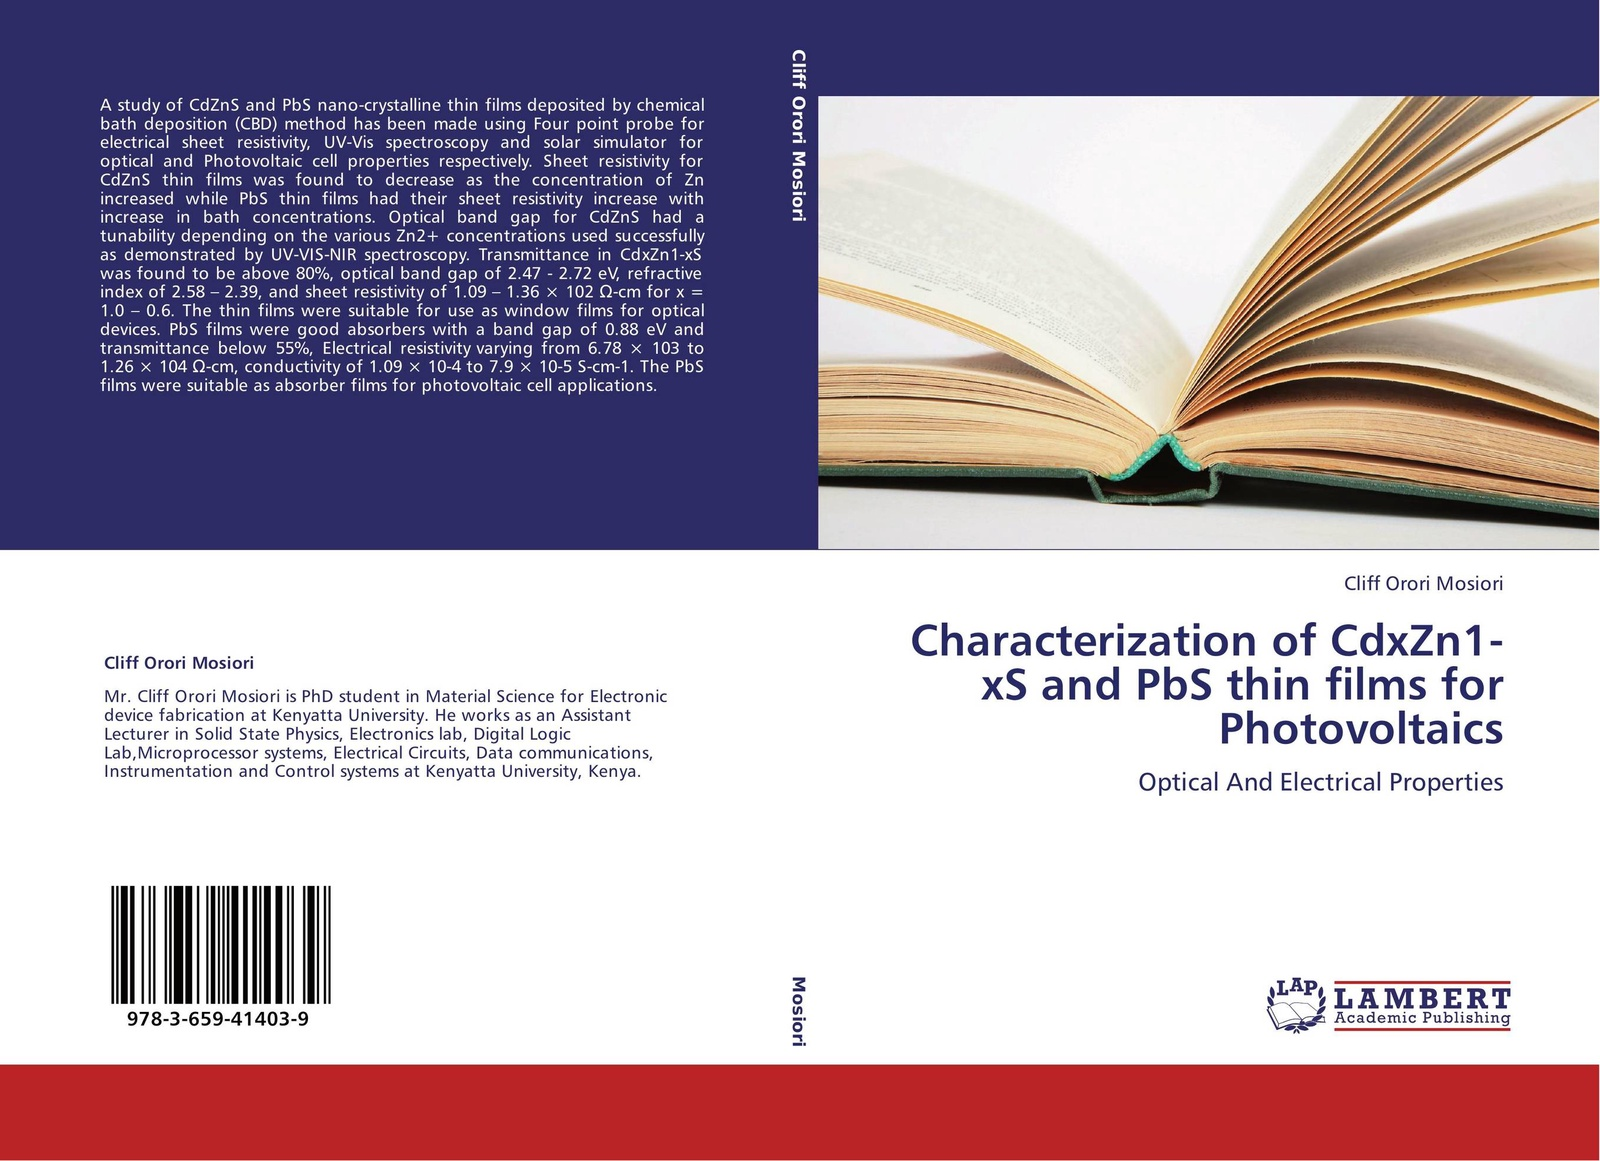 Cliff Orori Mosiori Characterization of CdxZn1-xS and PbS thin films for Photovoltaics kazi hussain a study of copper indium di sulfide semiconductor thin films